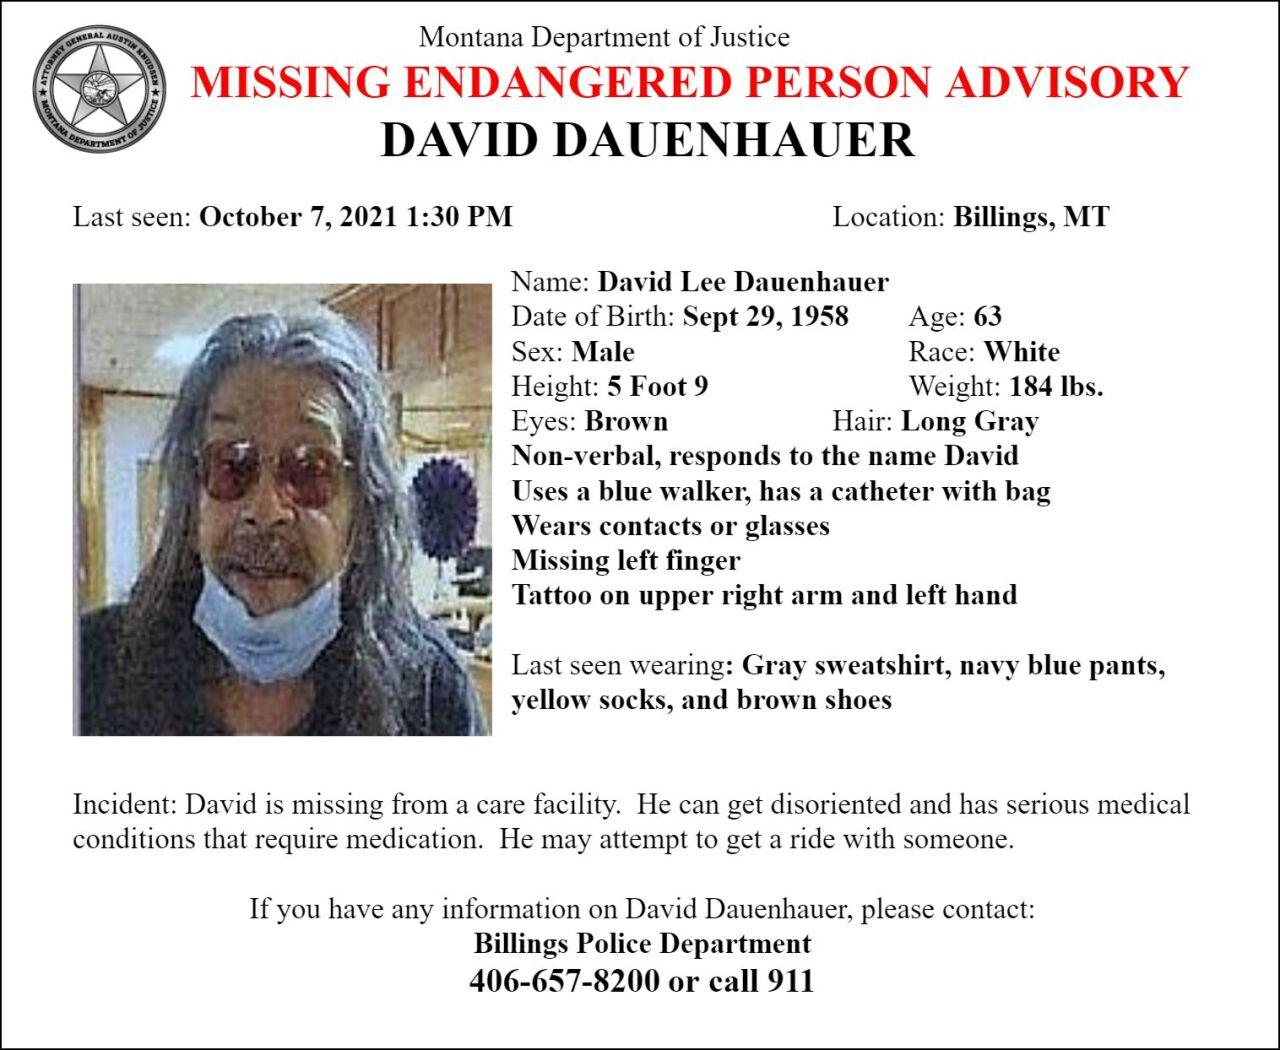 Missing-Endangered Person Advisory for David Lee Dauenhauer of Billings